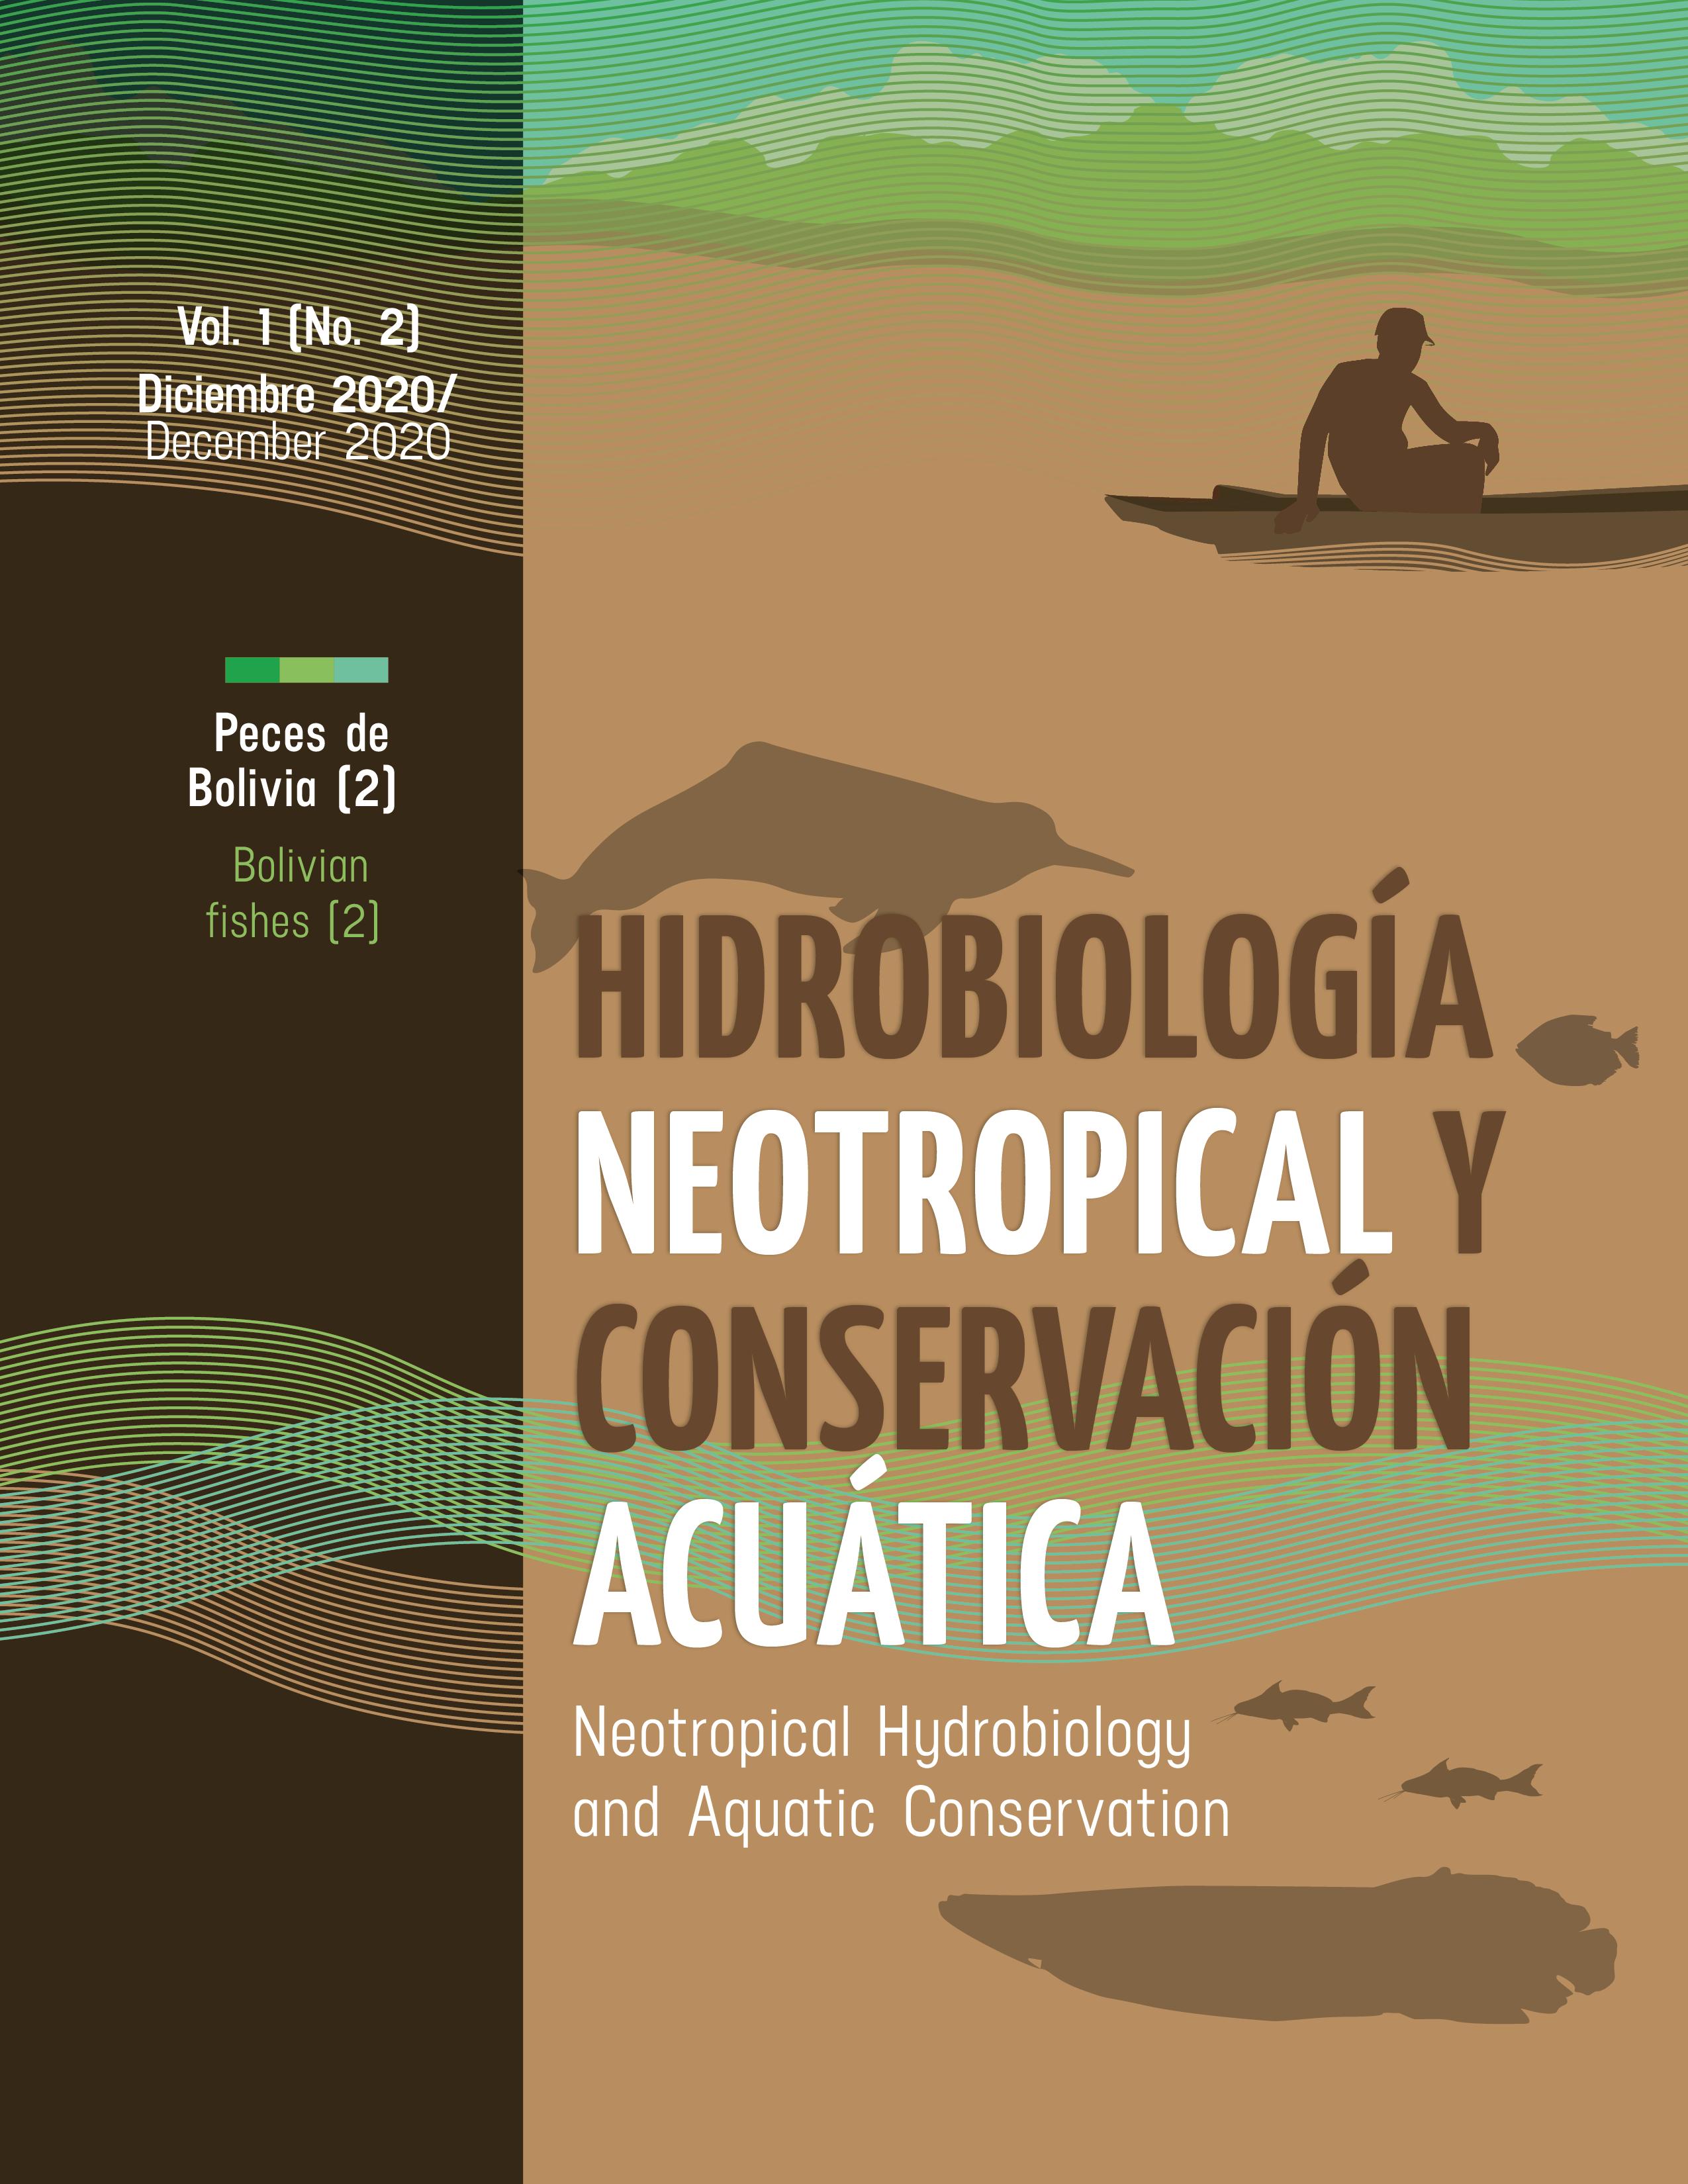 Neotropical Hydrobiology & Aquatc Conservation (2020) Vol. 1 (2)